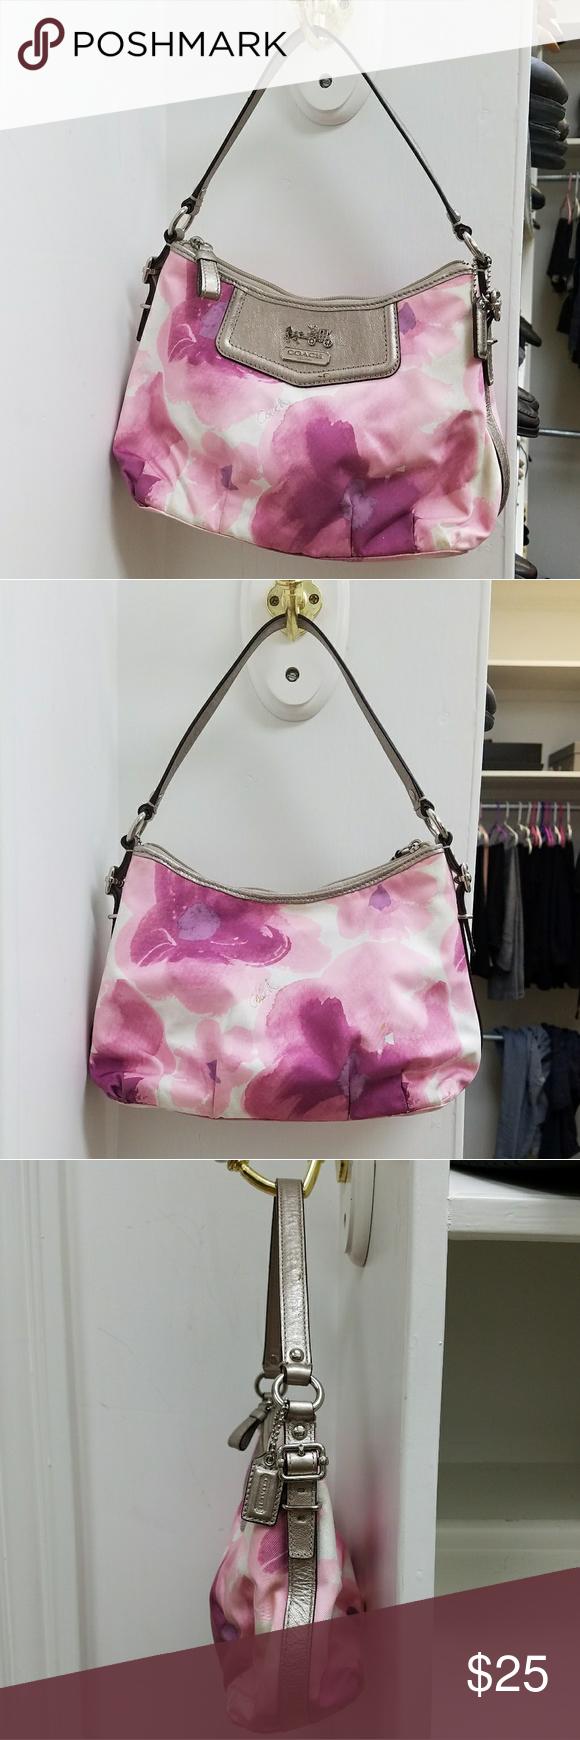 580x1740 Coach Watercolor Floral Print Purse Small Handbag. Pink, Purple